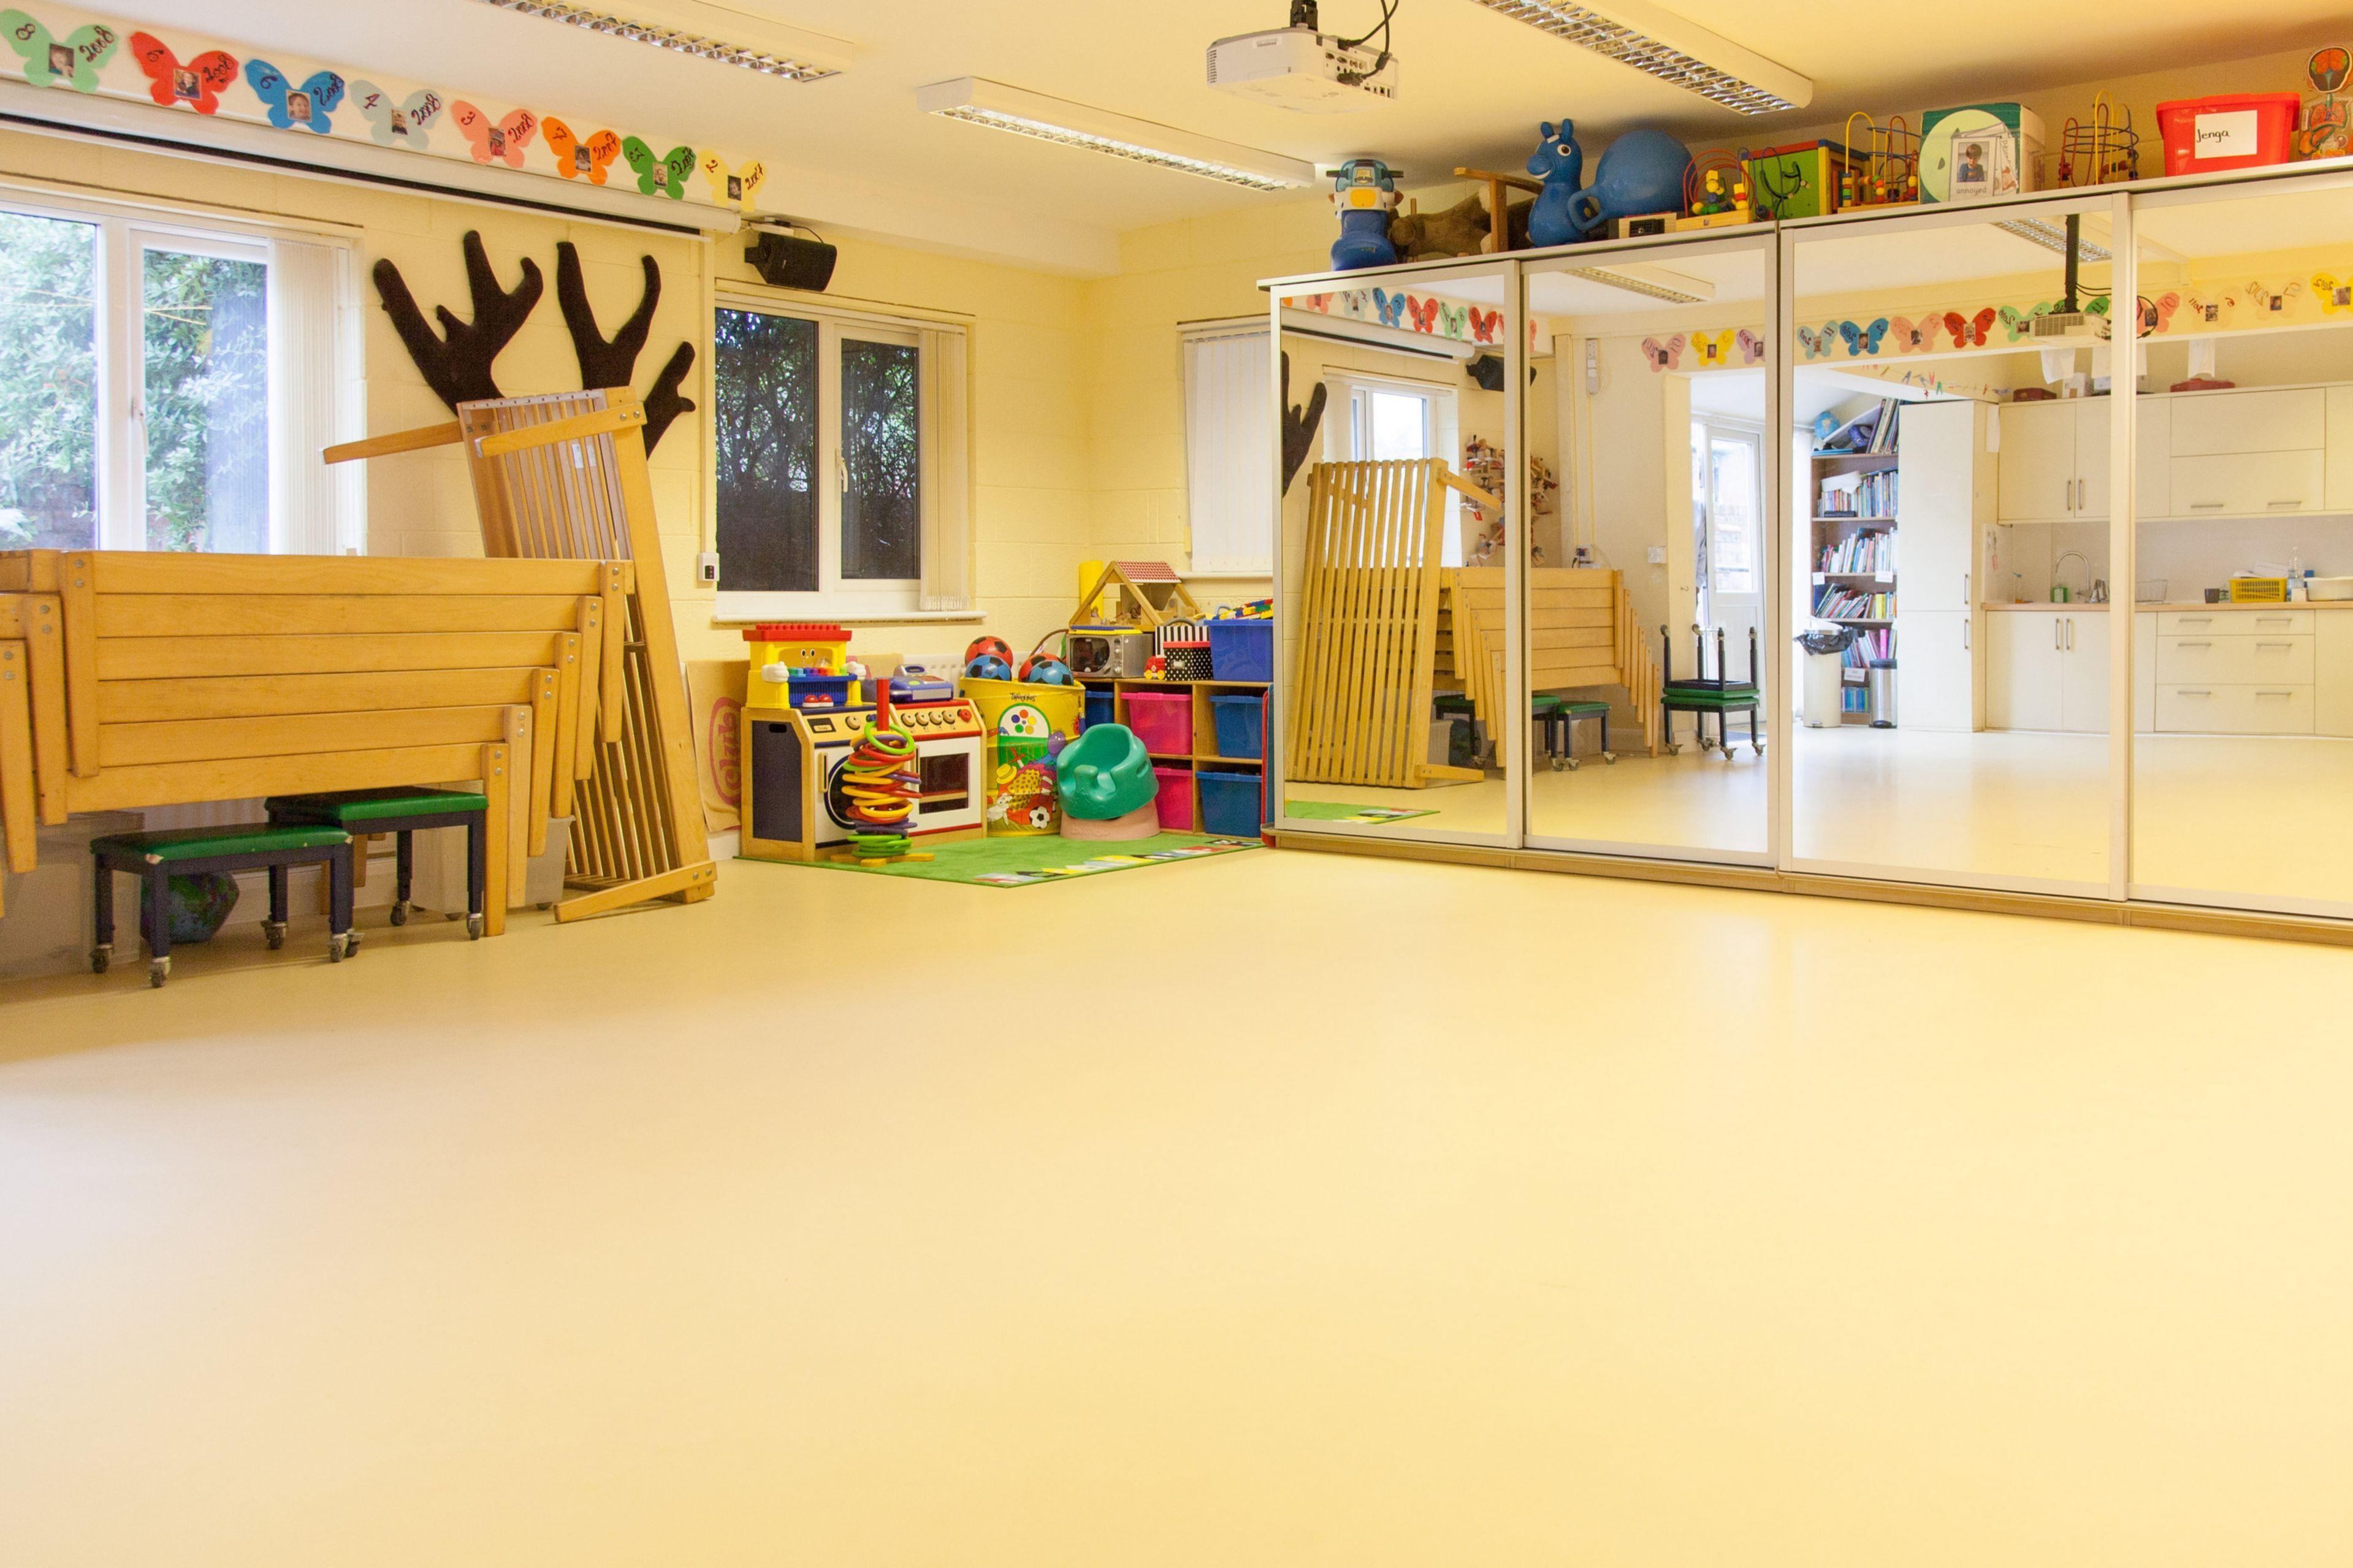 Classroom floor of Stick 'n' Step Charity School in Merseyside, UK